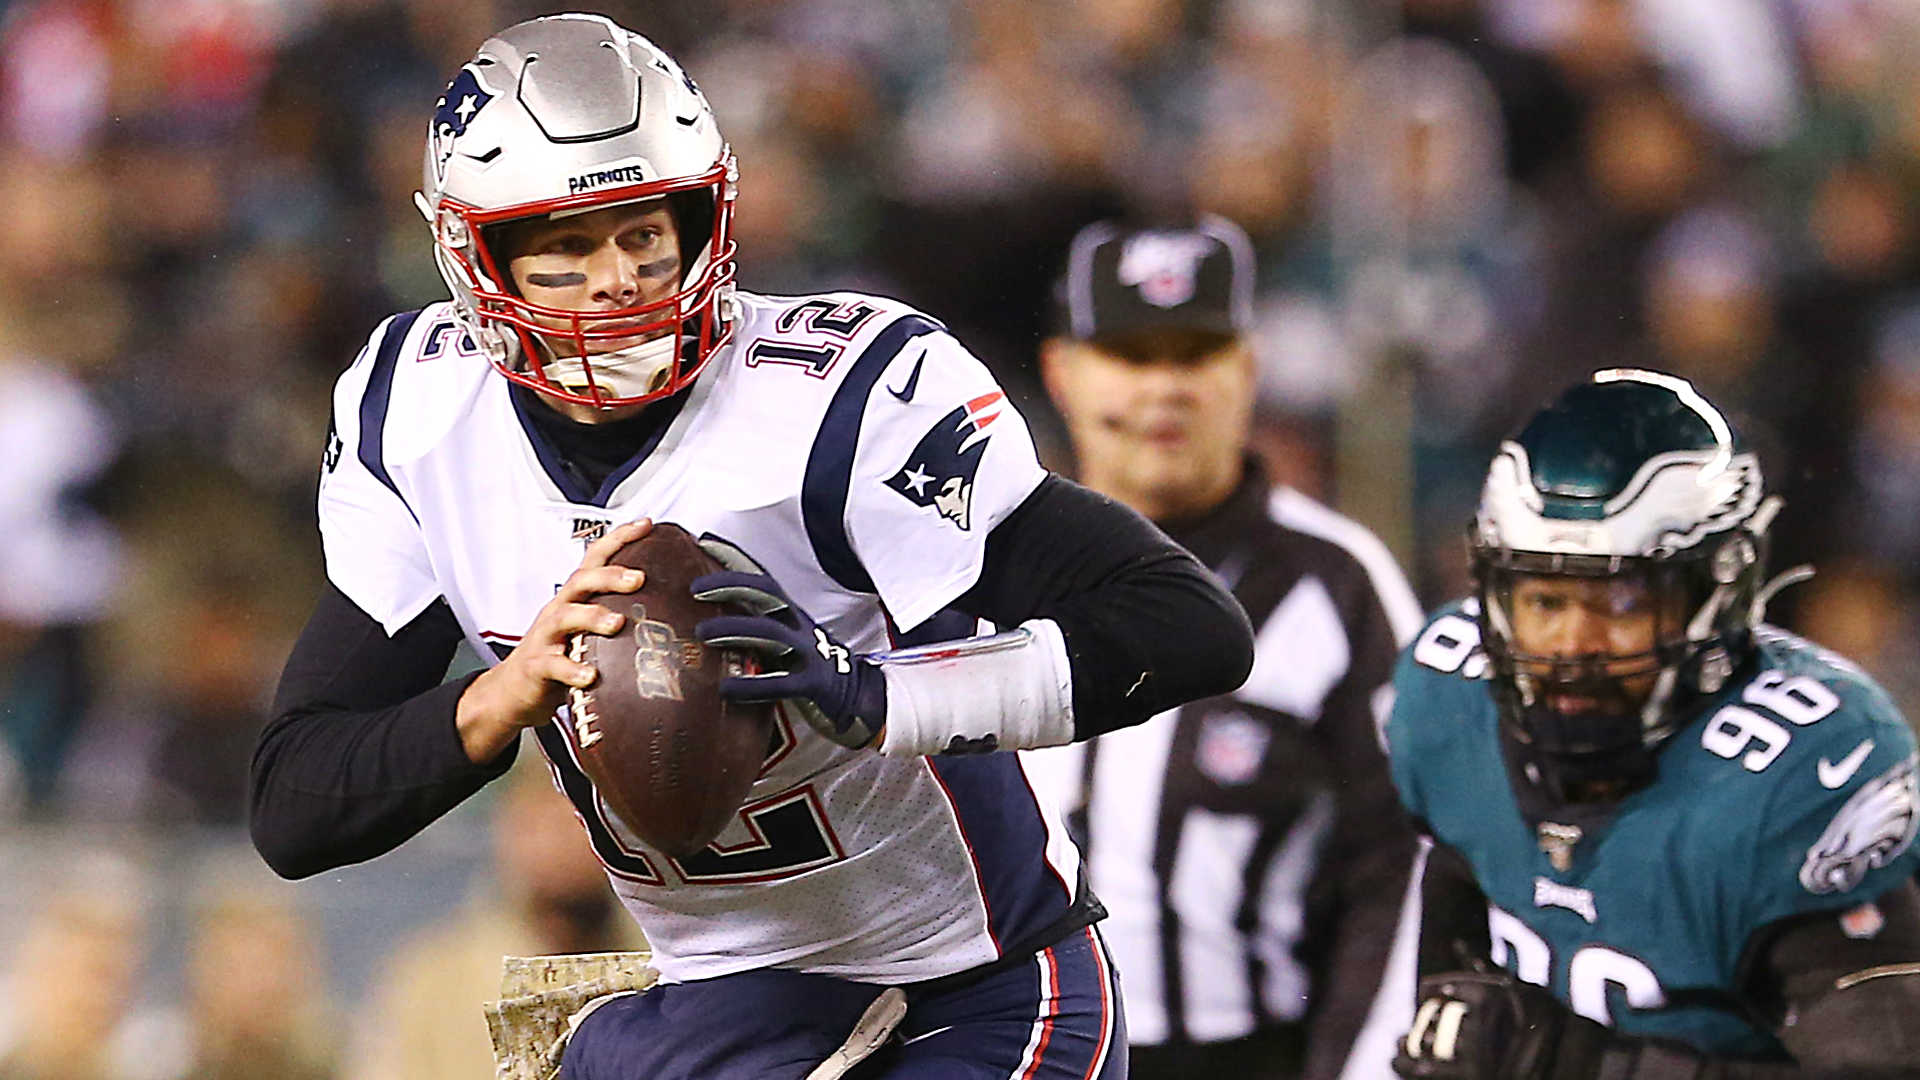 Patriots vs. Eagles: Three takeaways from Tom Brady's latest gritty comeback win